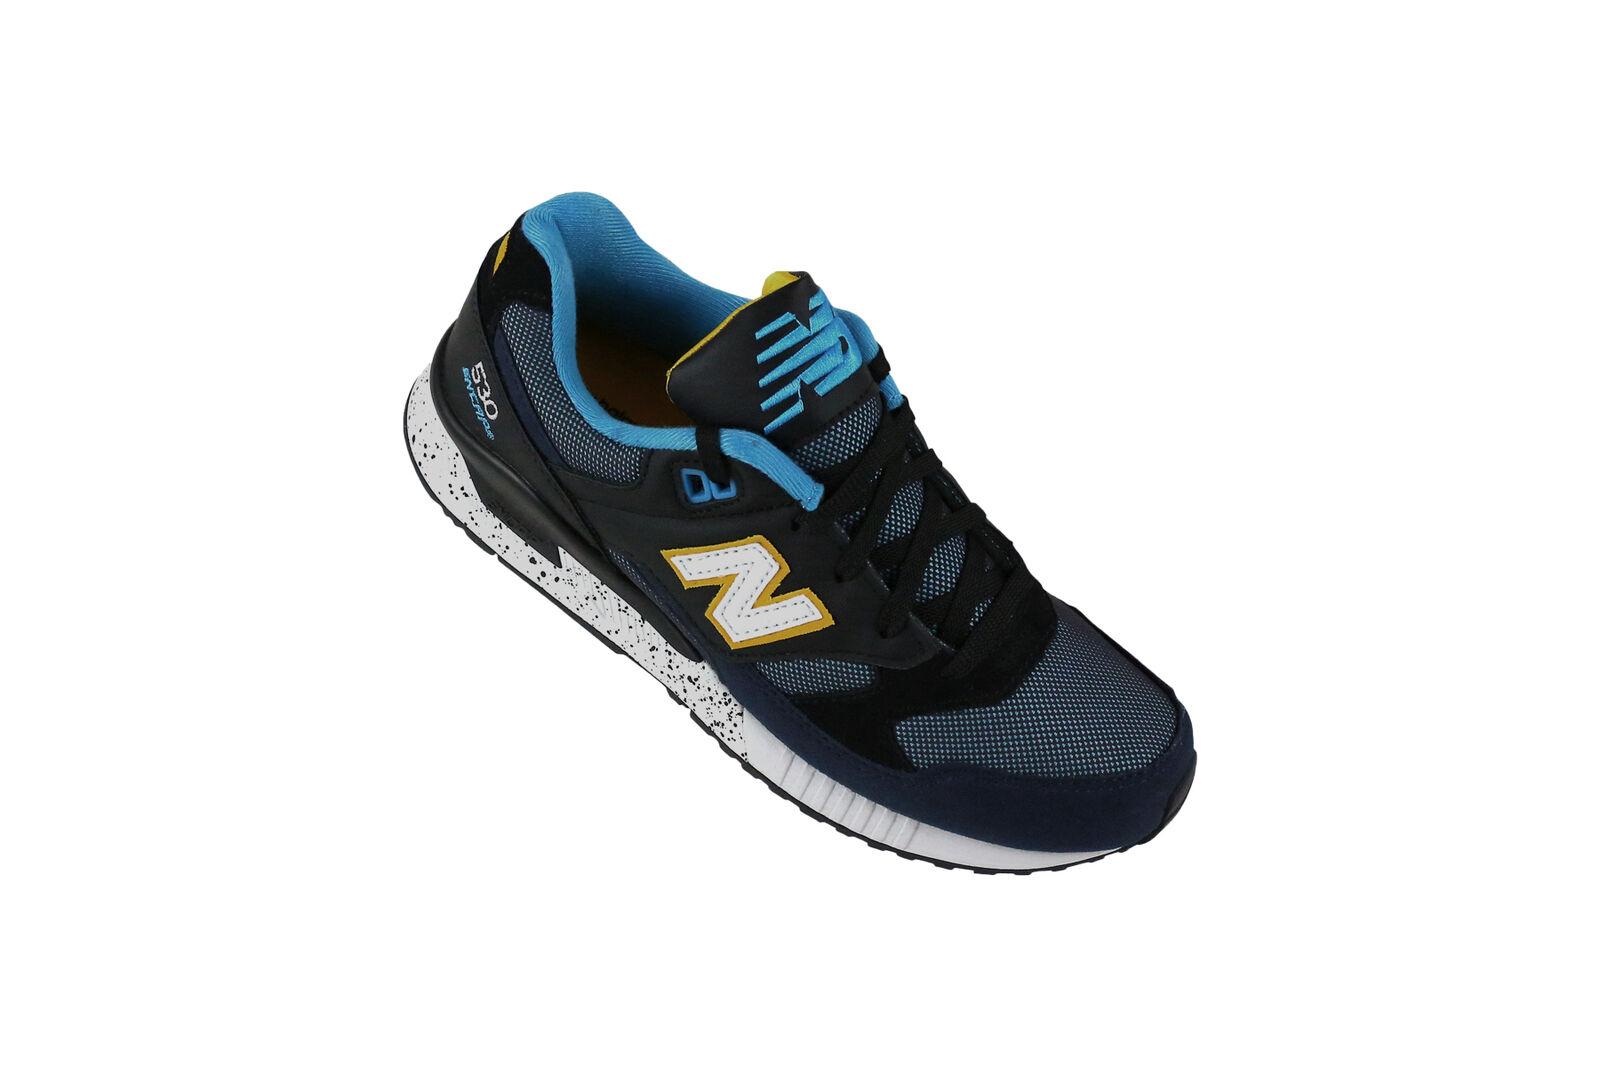 navy dark KIB M530 New Turnschuhe Balance blau Schuhe Lauf